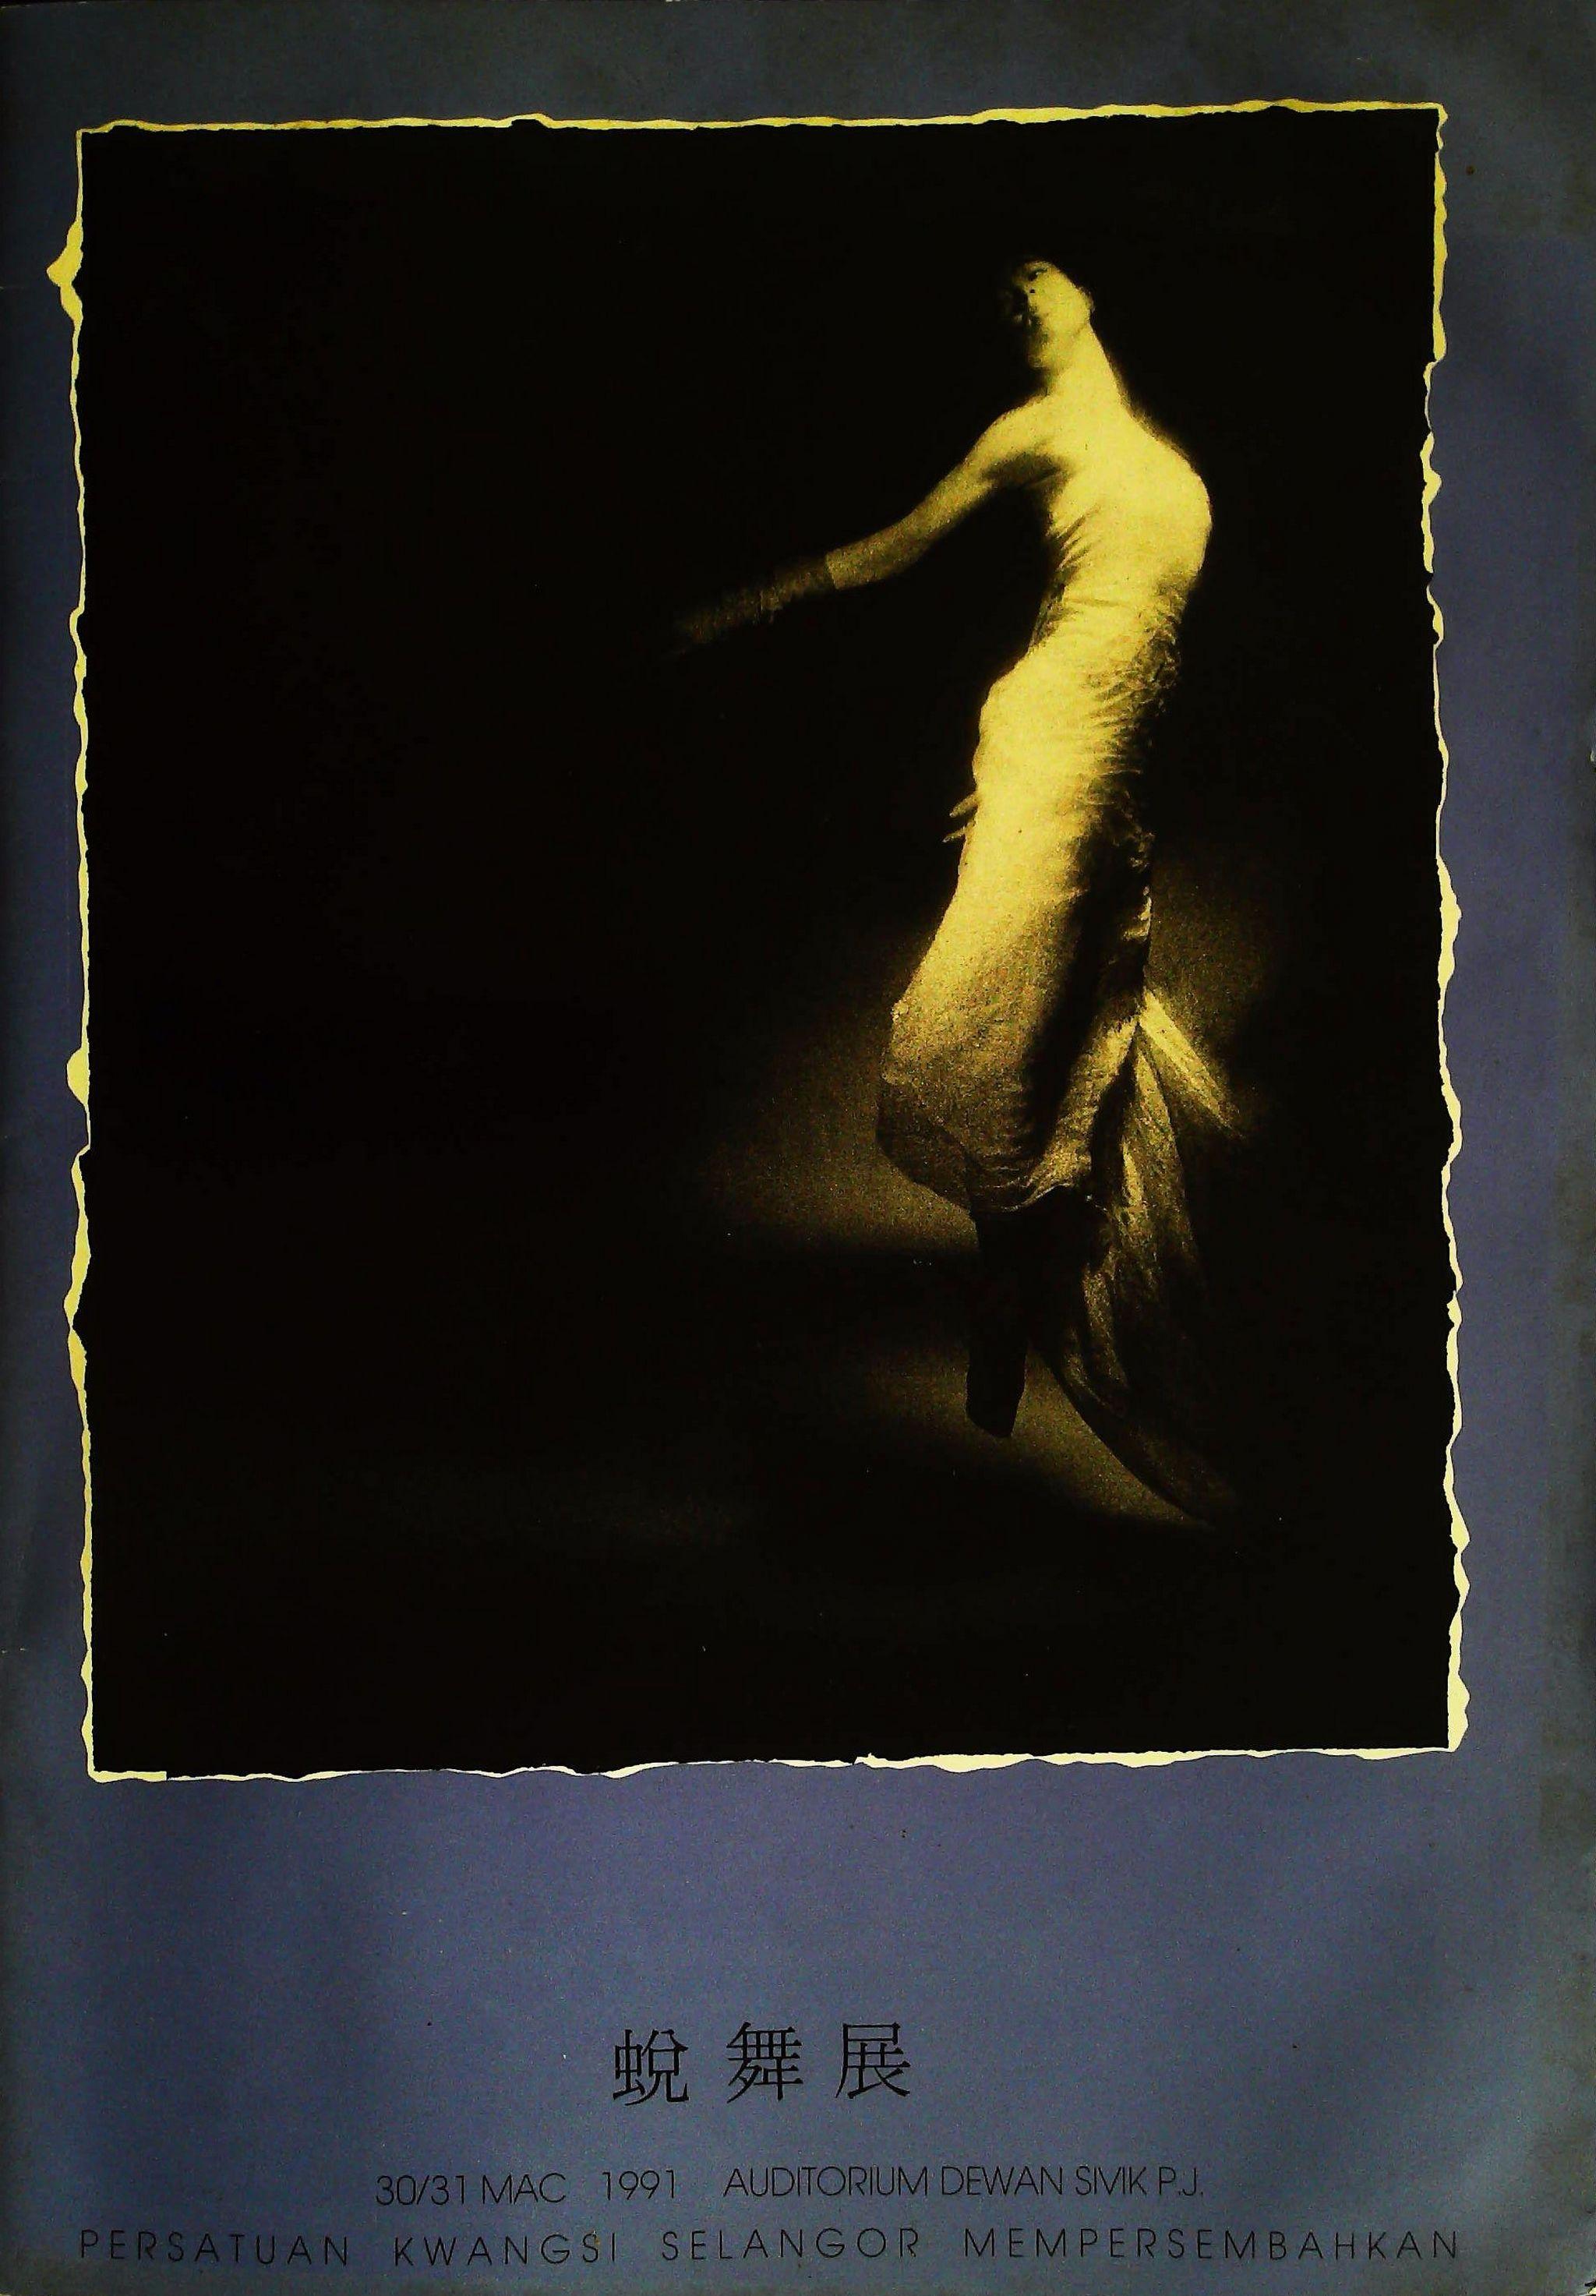 1991 Tui Dance Show Cover